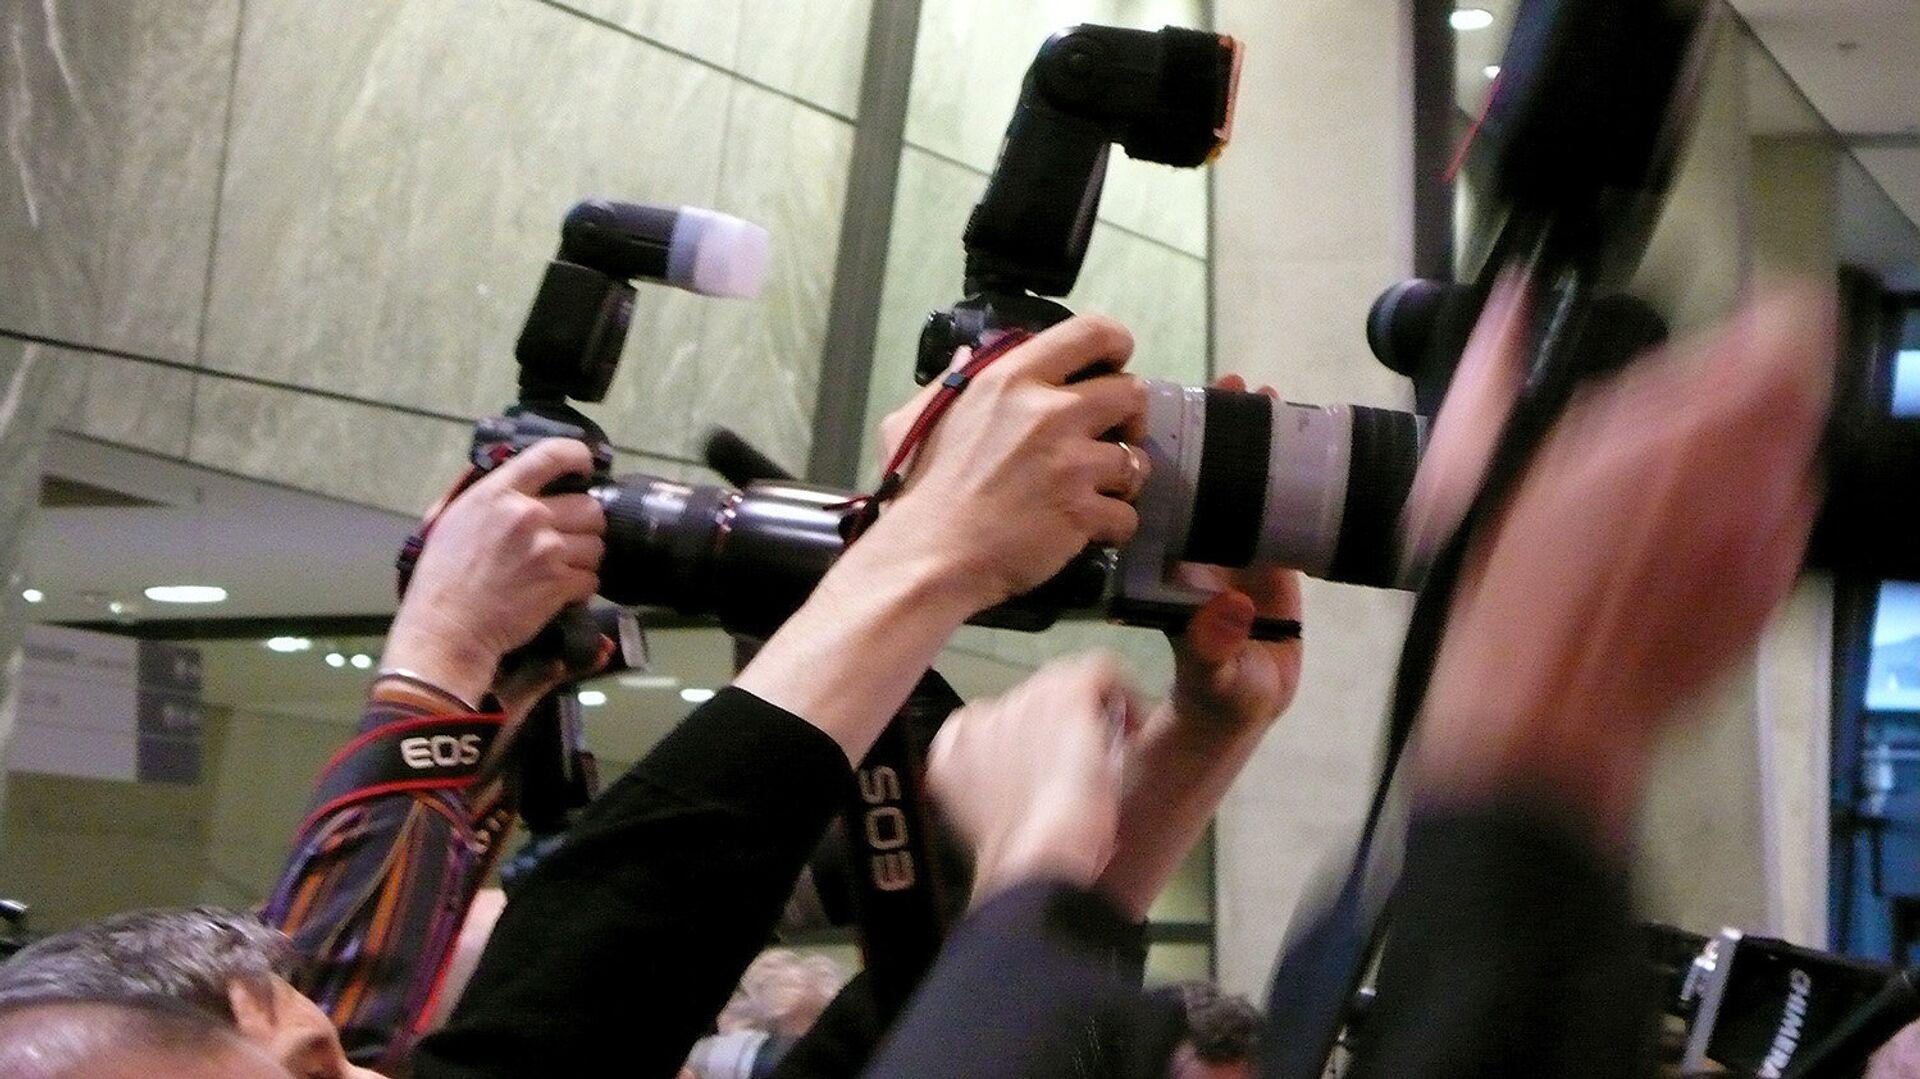 Фоторепортеры на пресс-конференции - Sputnik Узбекистан, 1920, 09.08.2021